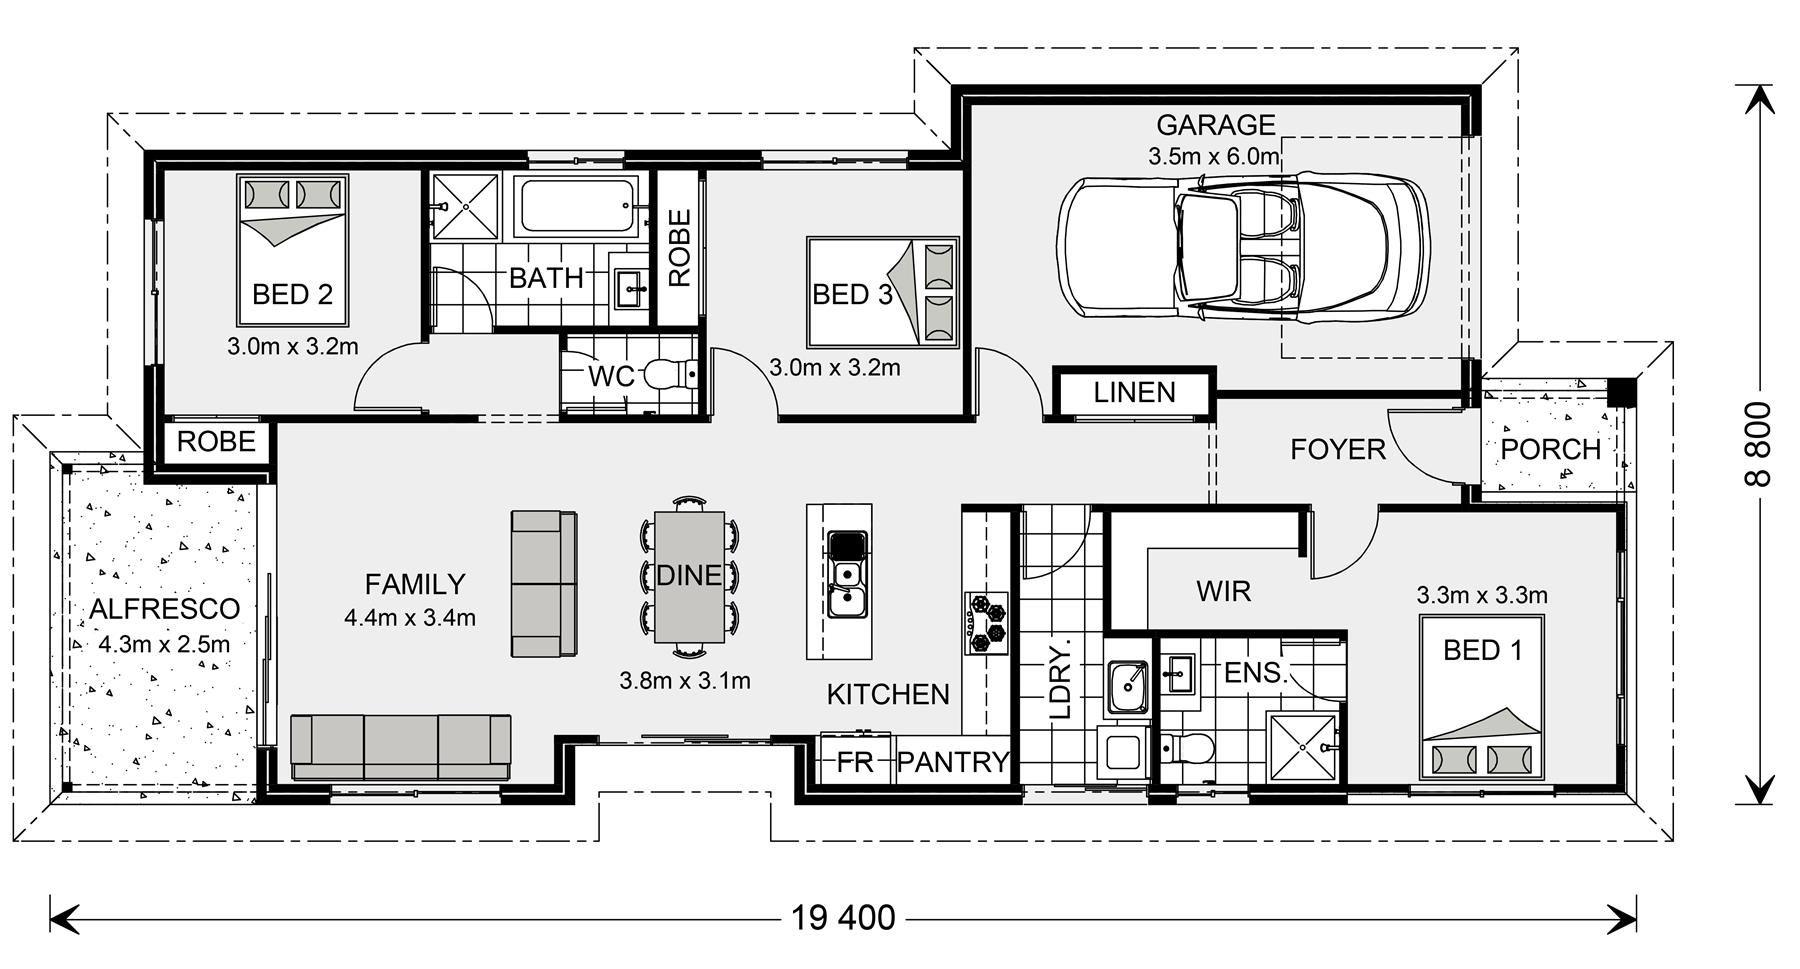 Lot 7065, 2 Amble Way, Melton South VIC 3338, Image 1